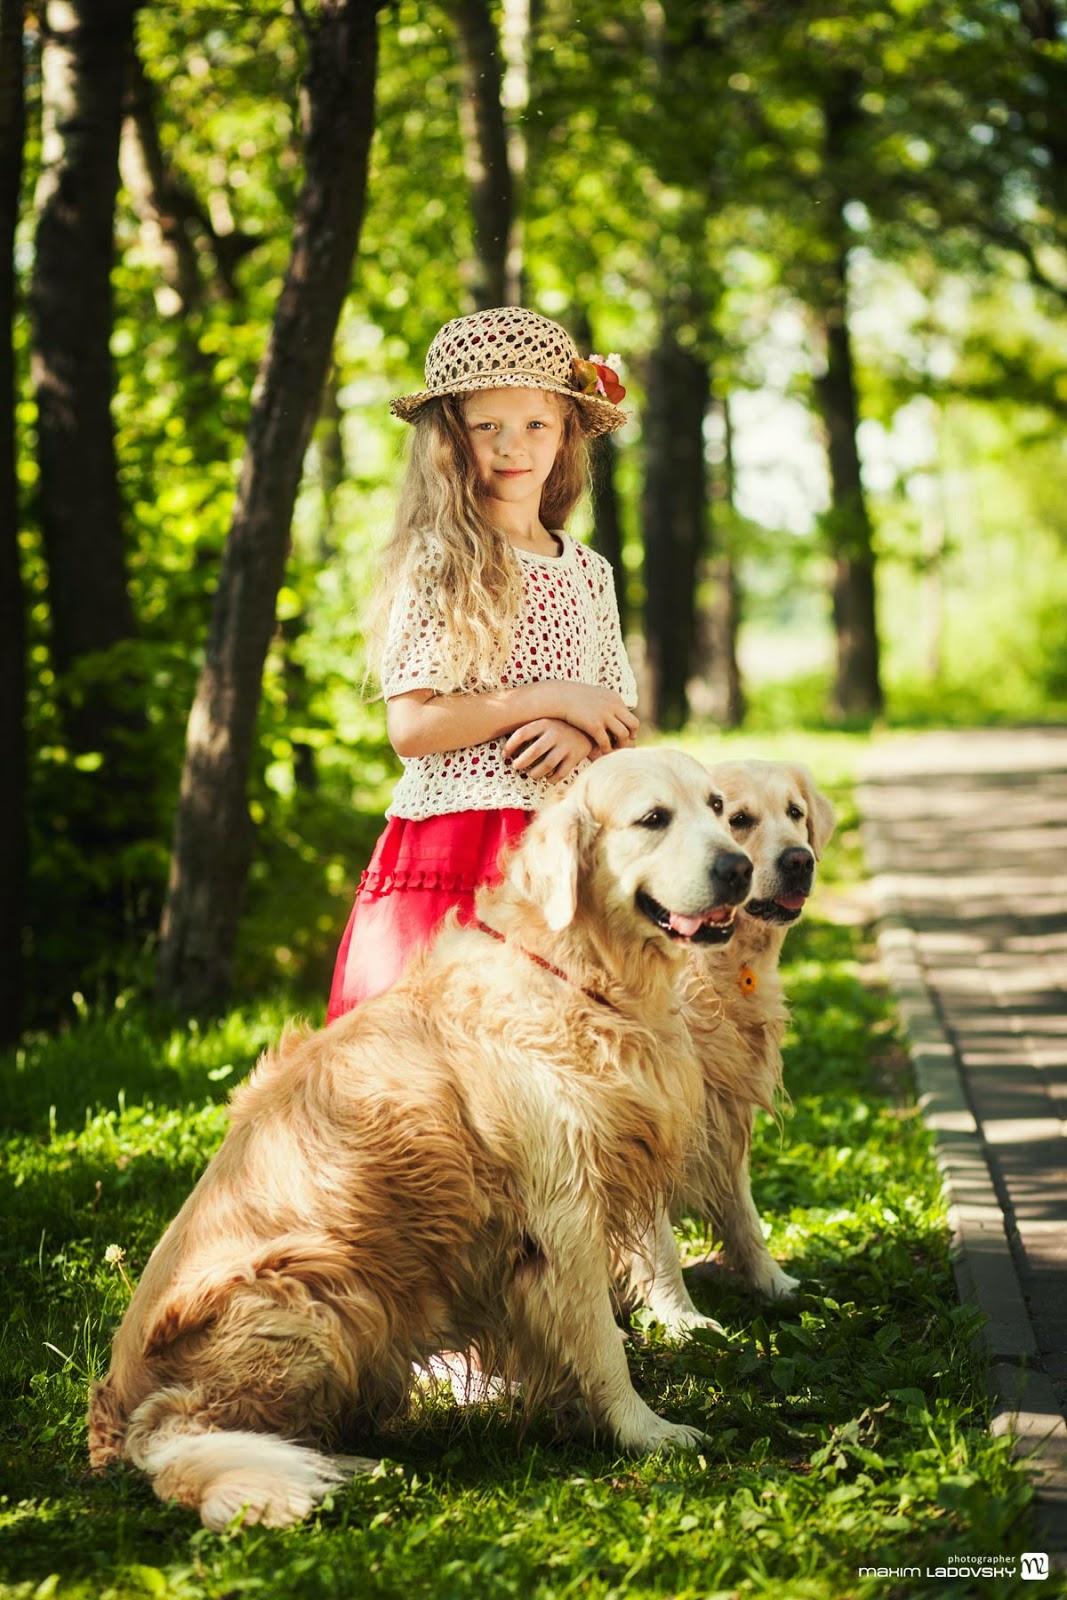 милая фотосъемка девочки с собаками